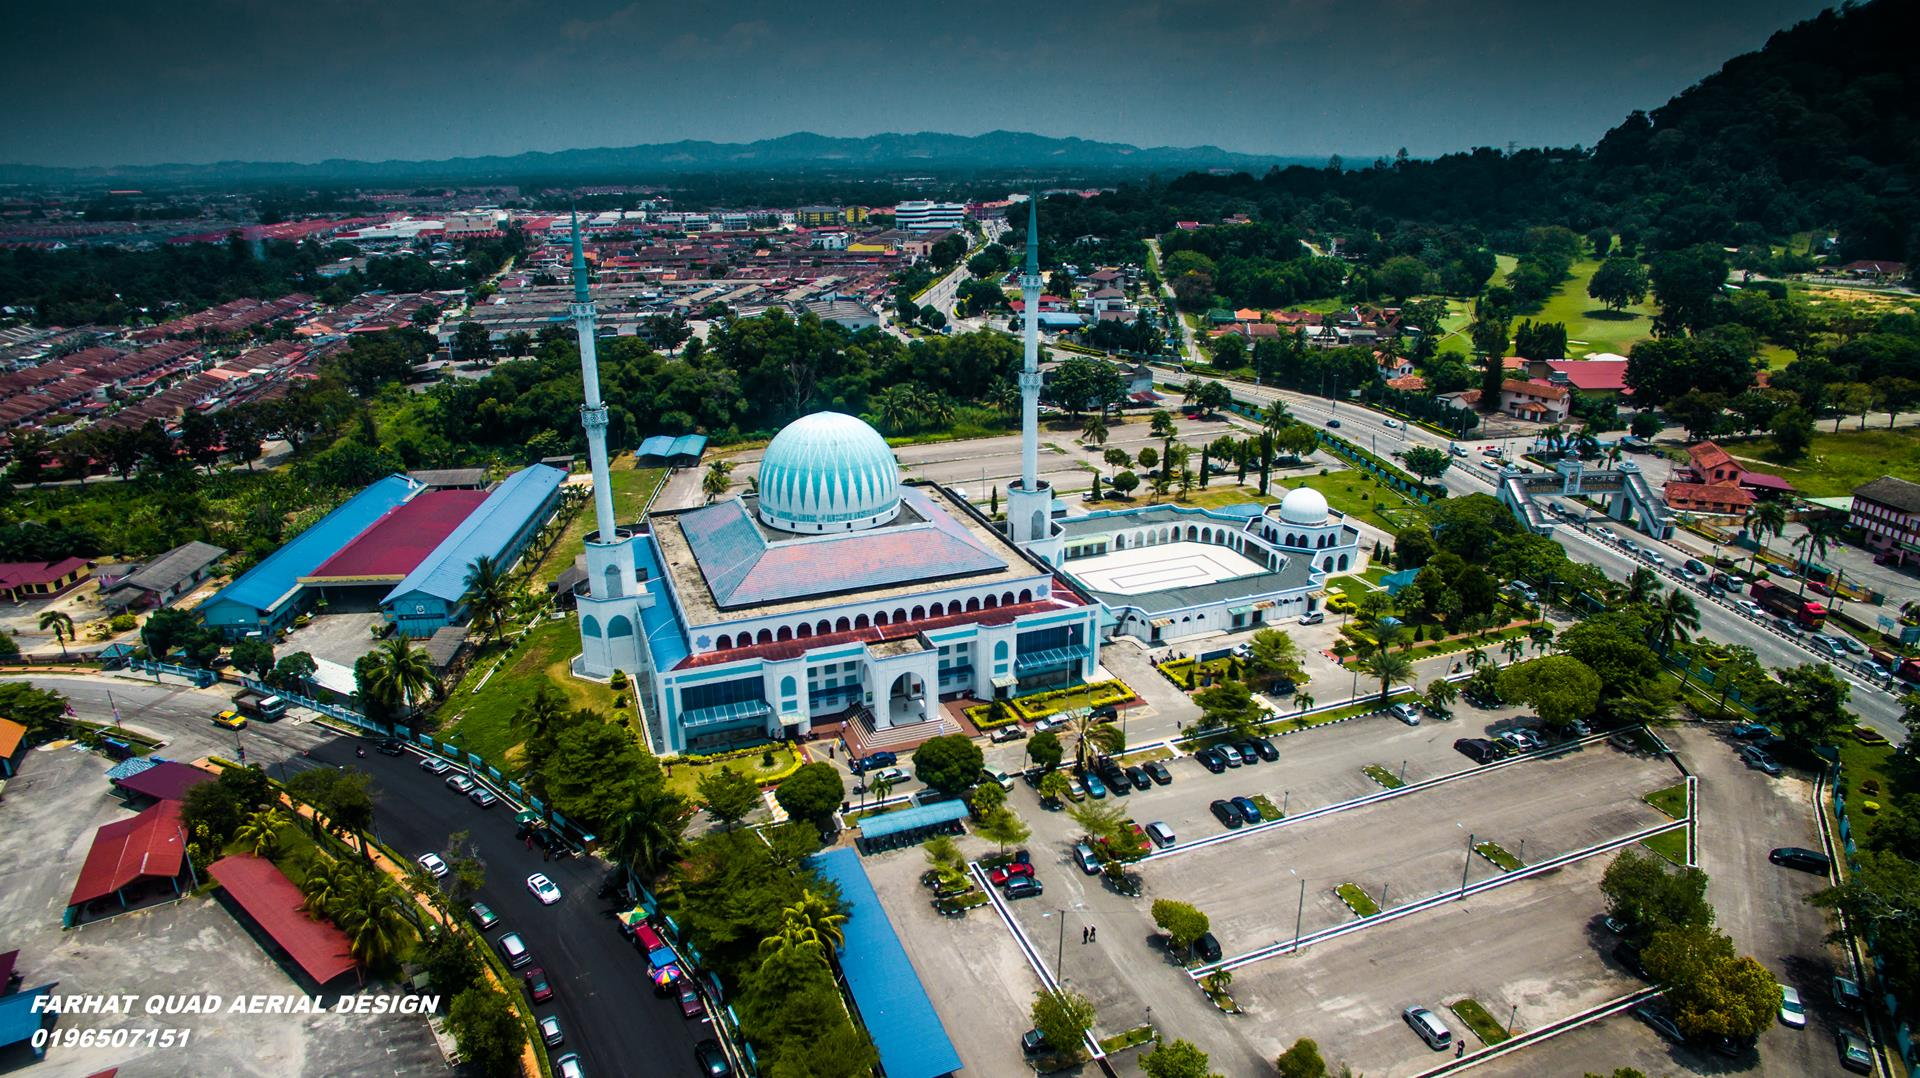 Masjid Batu Pahat aerial fotografi